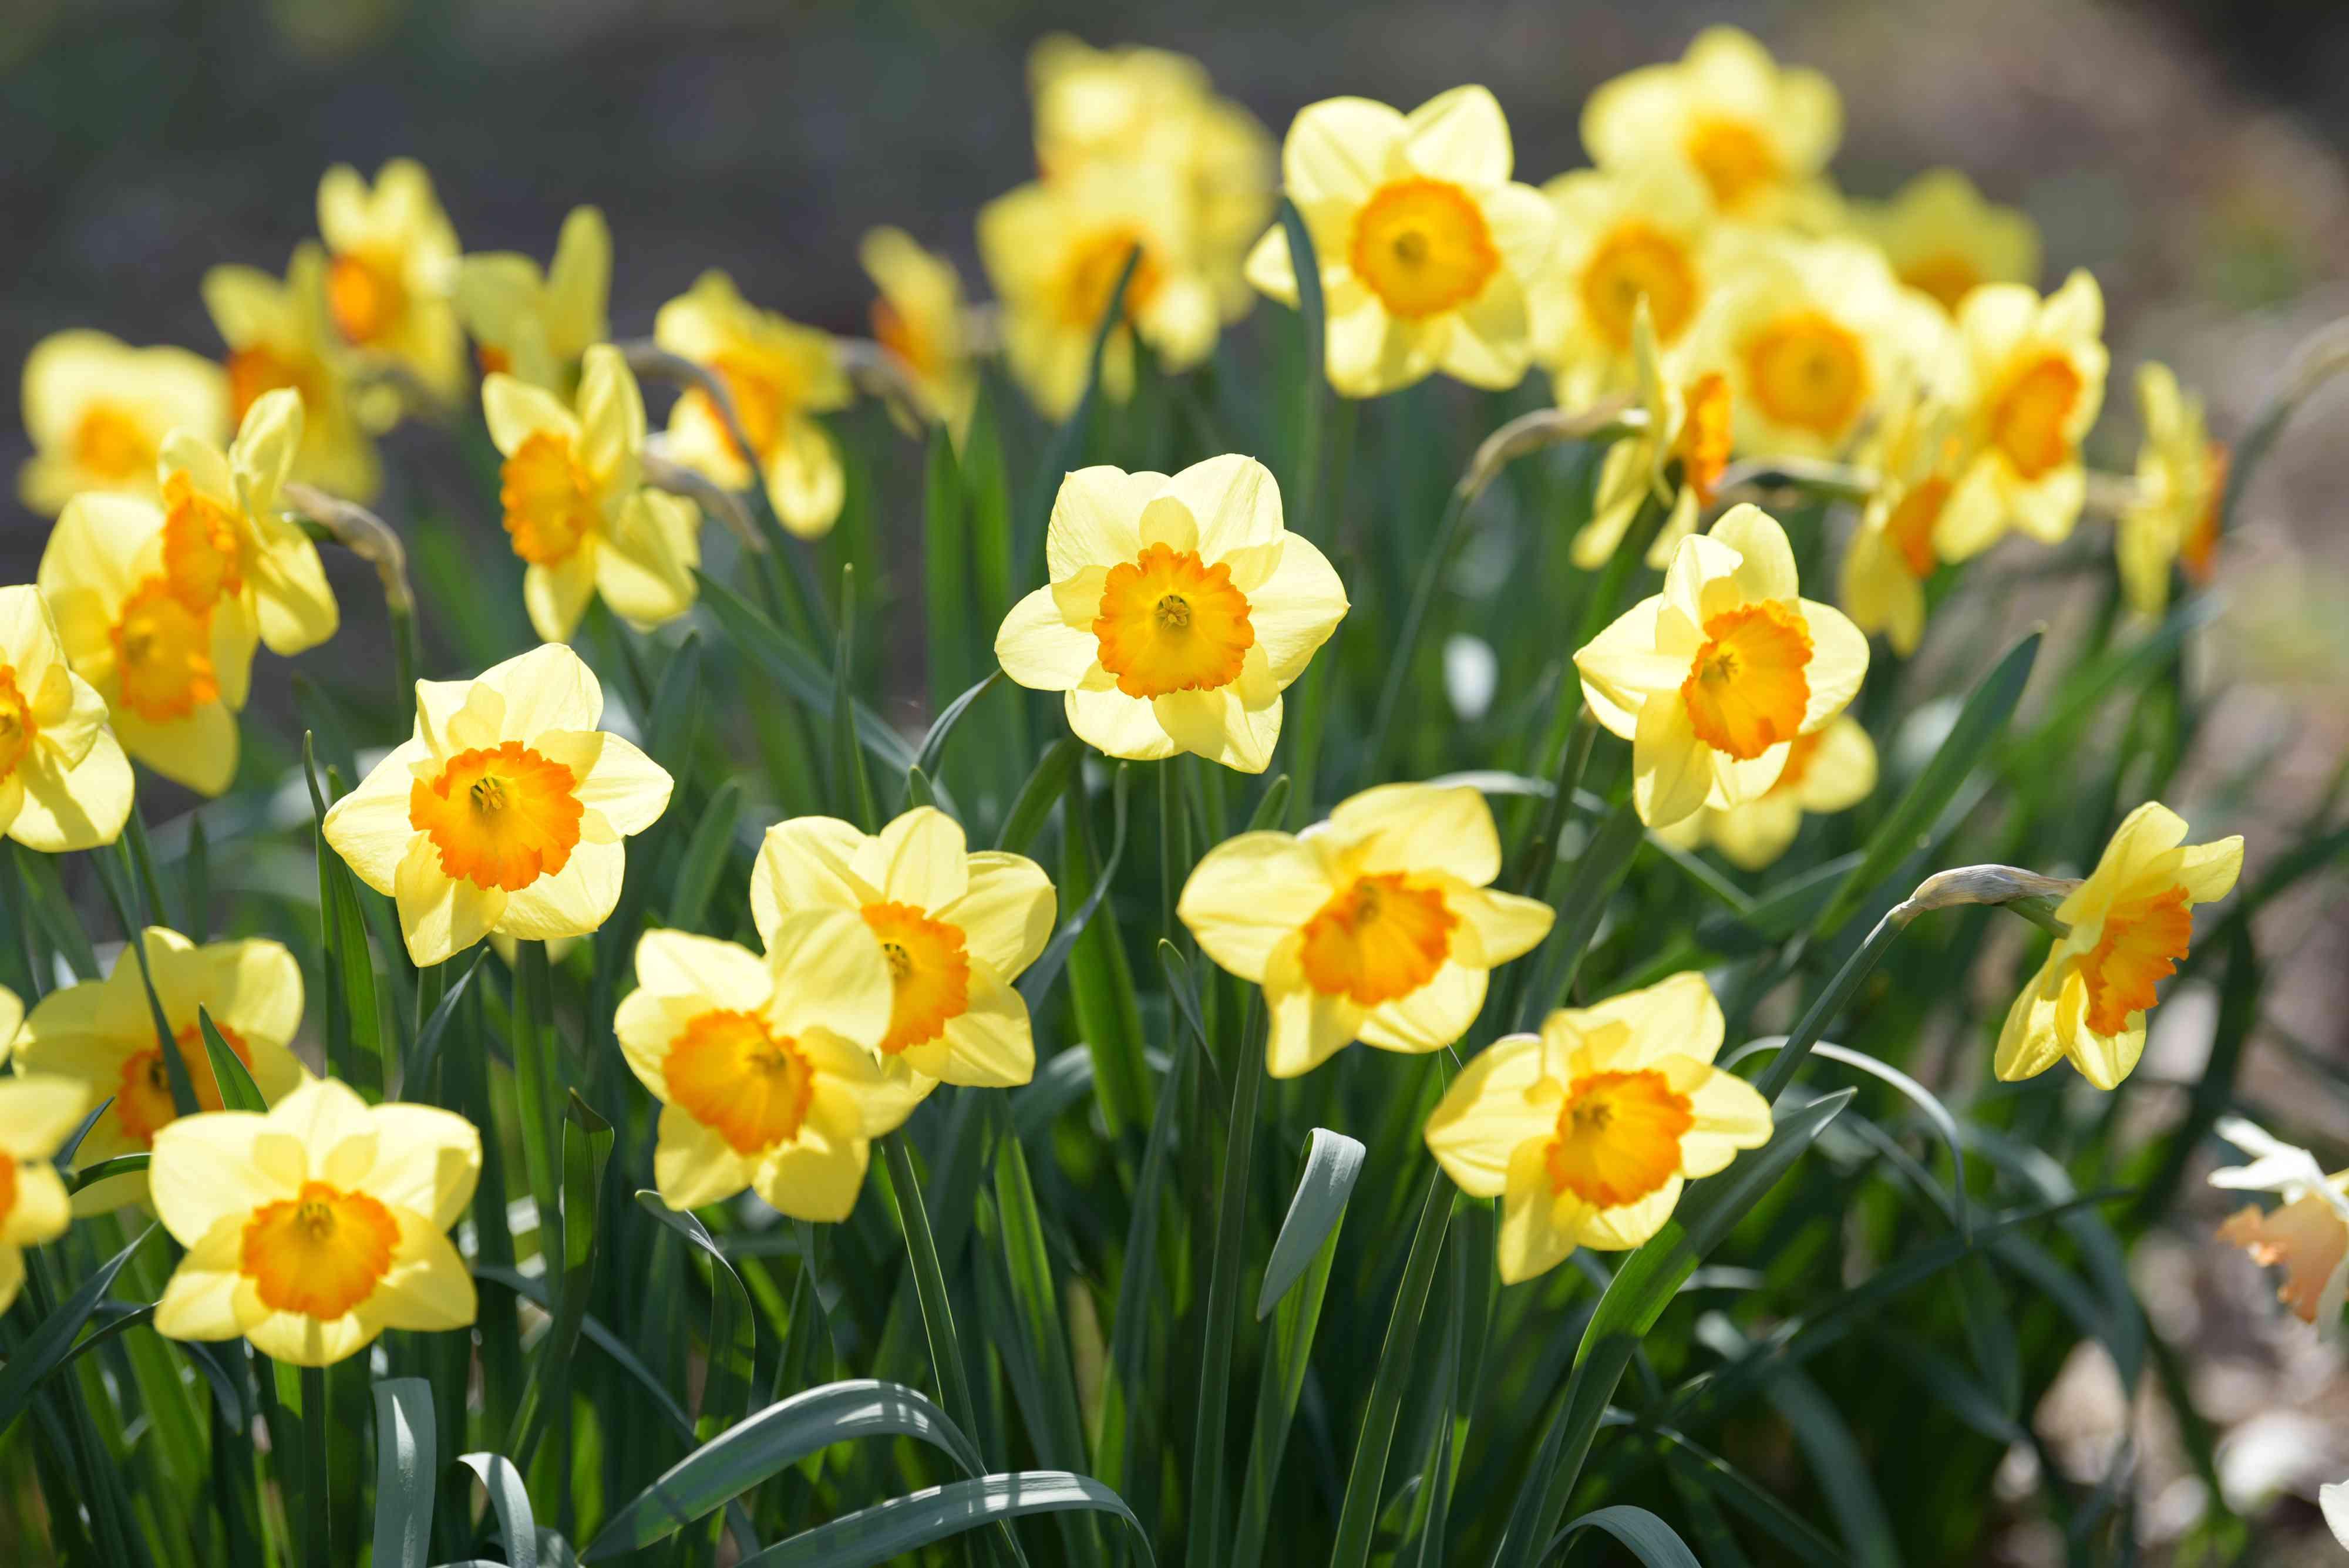 Light yellow and orange daffodil flowers